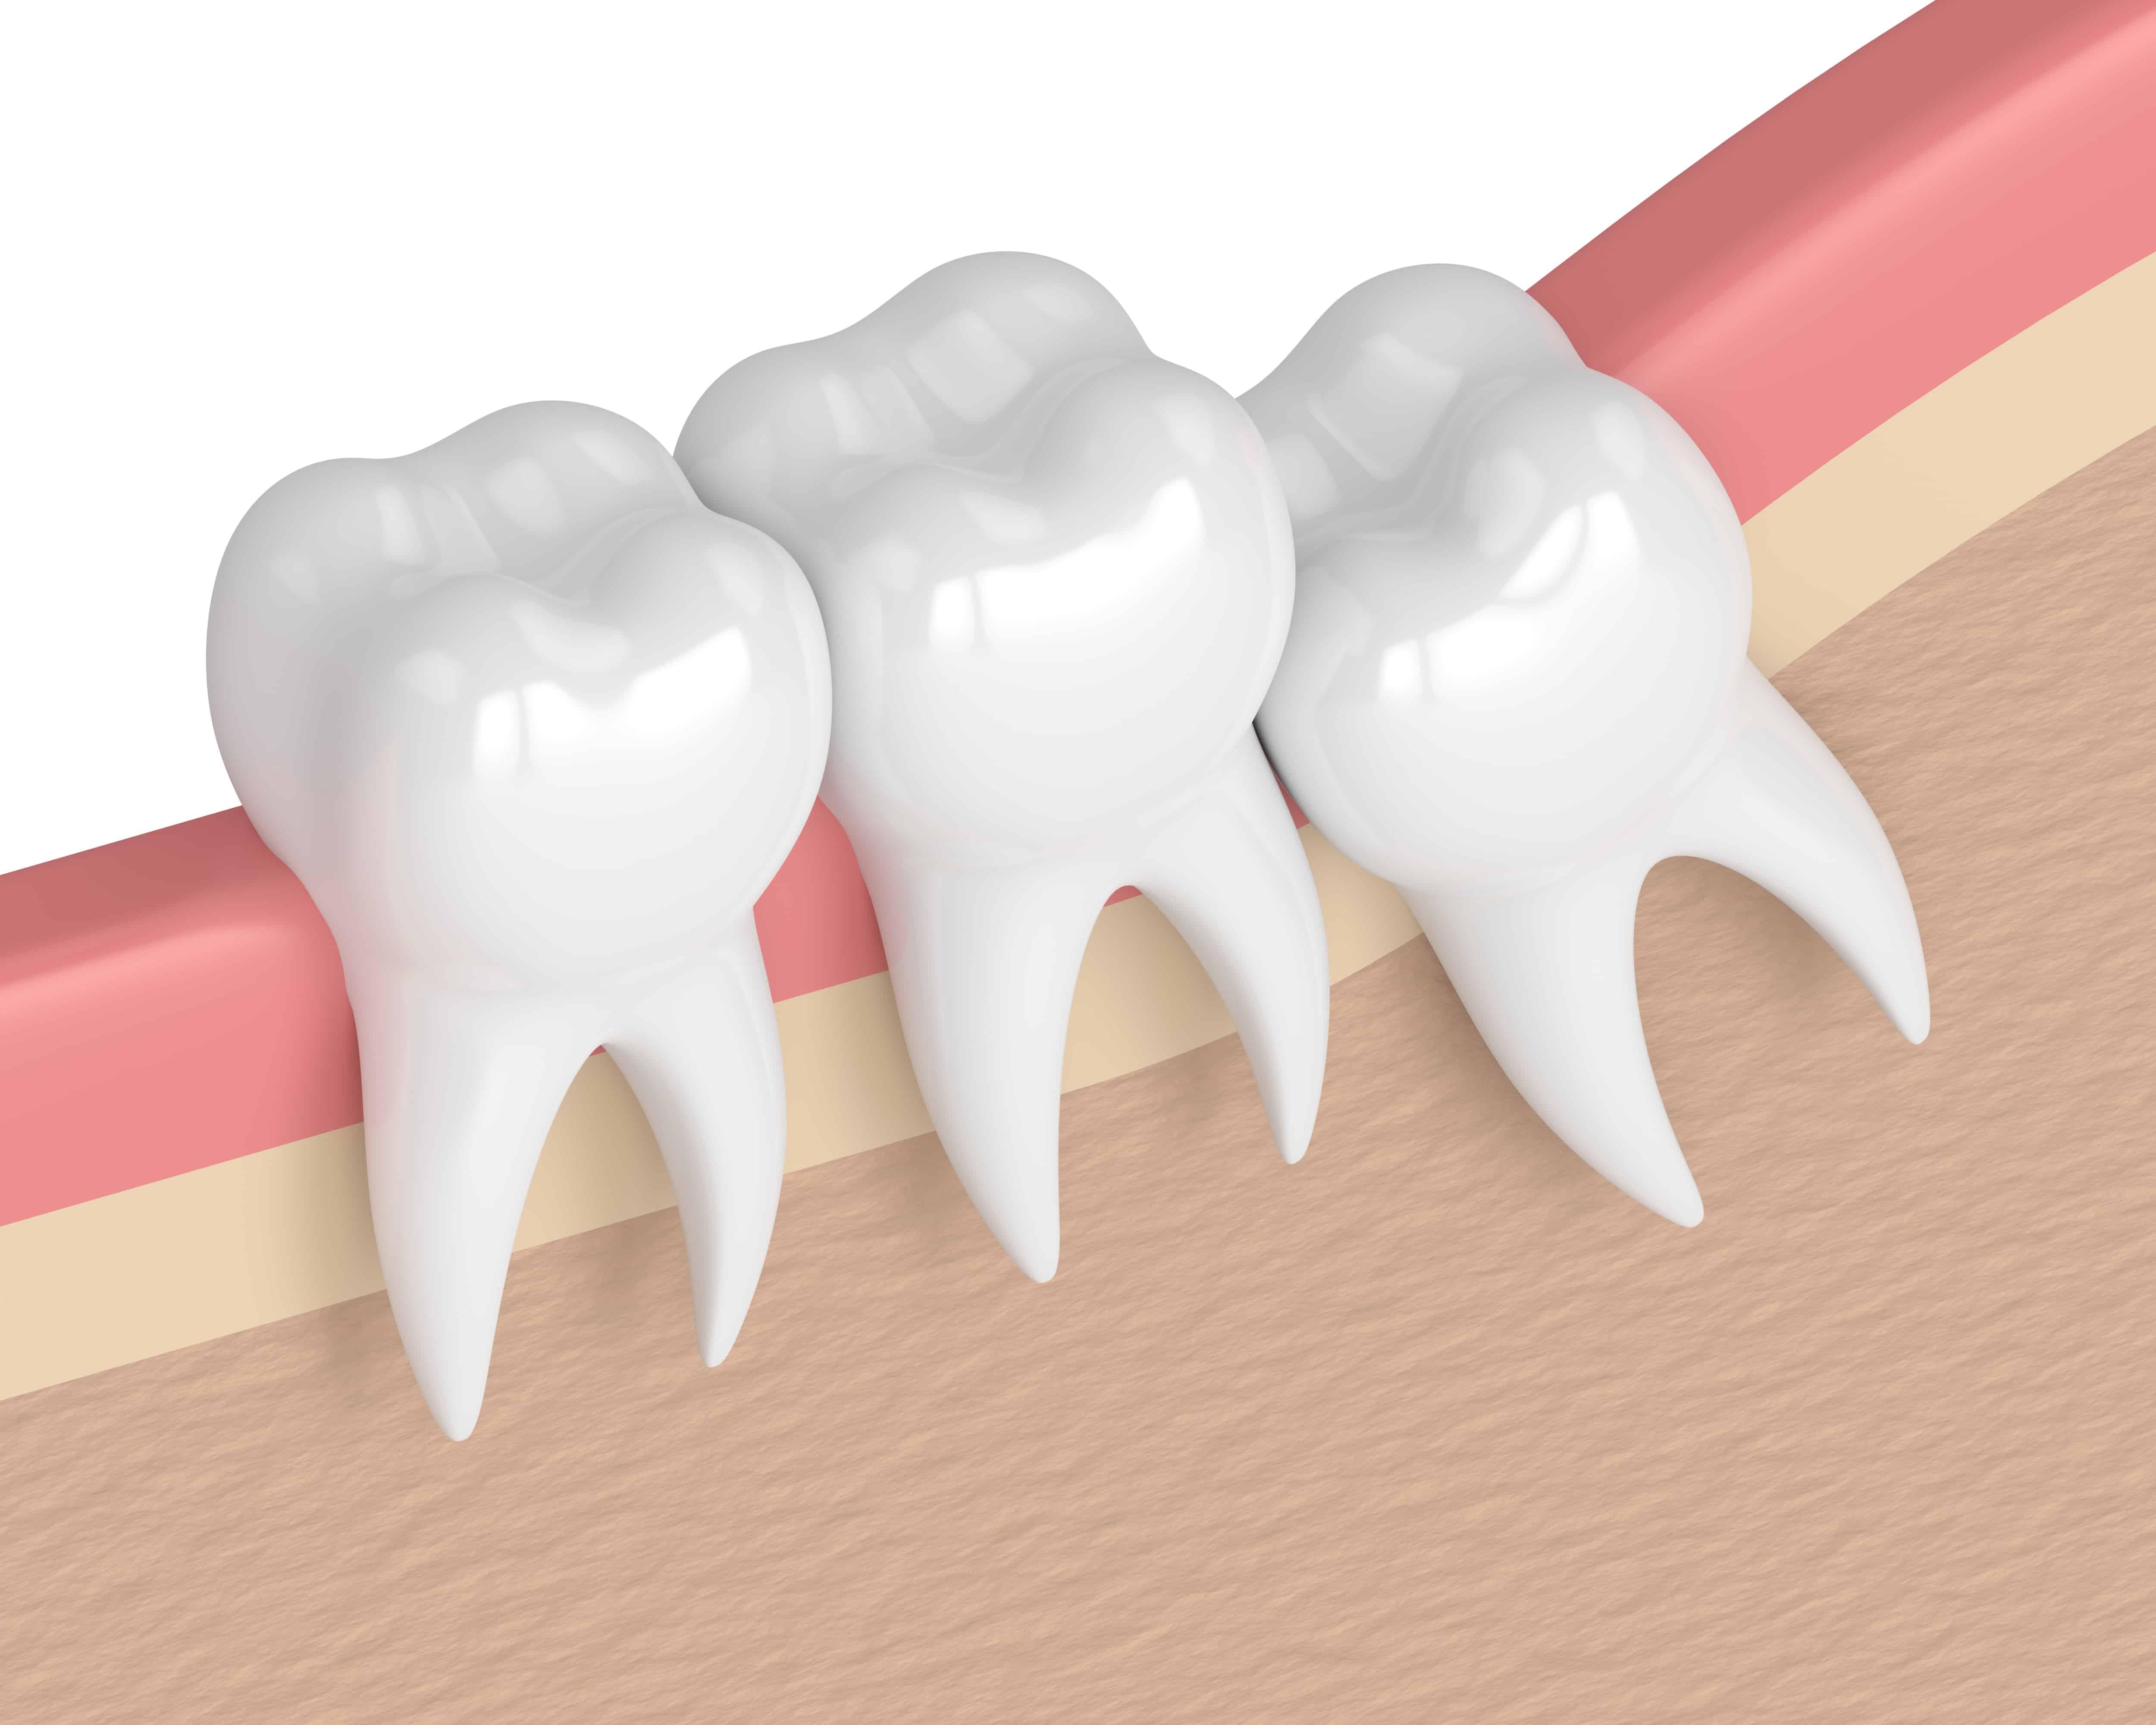 Wisdom teeth extraction Montreal